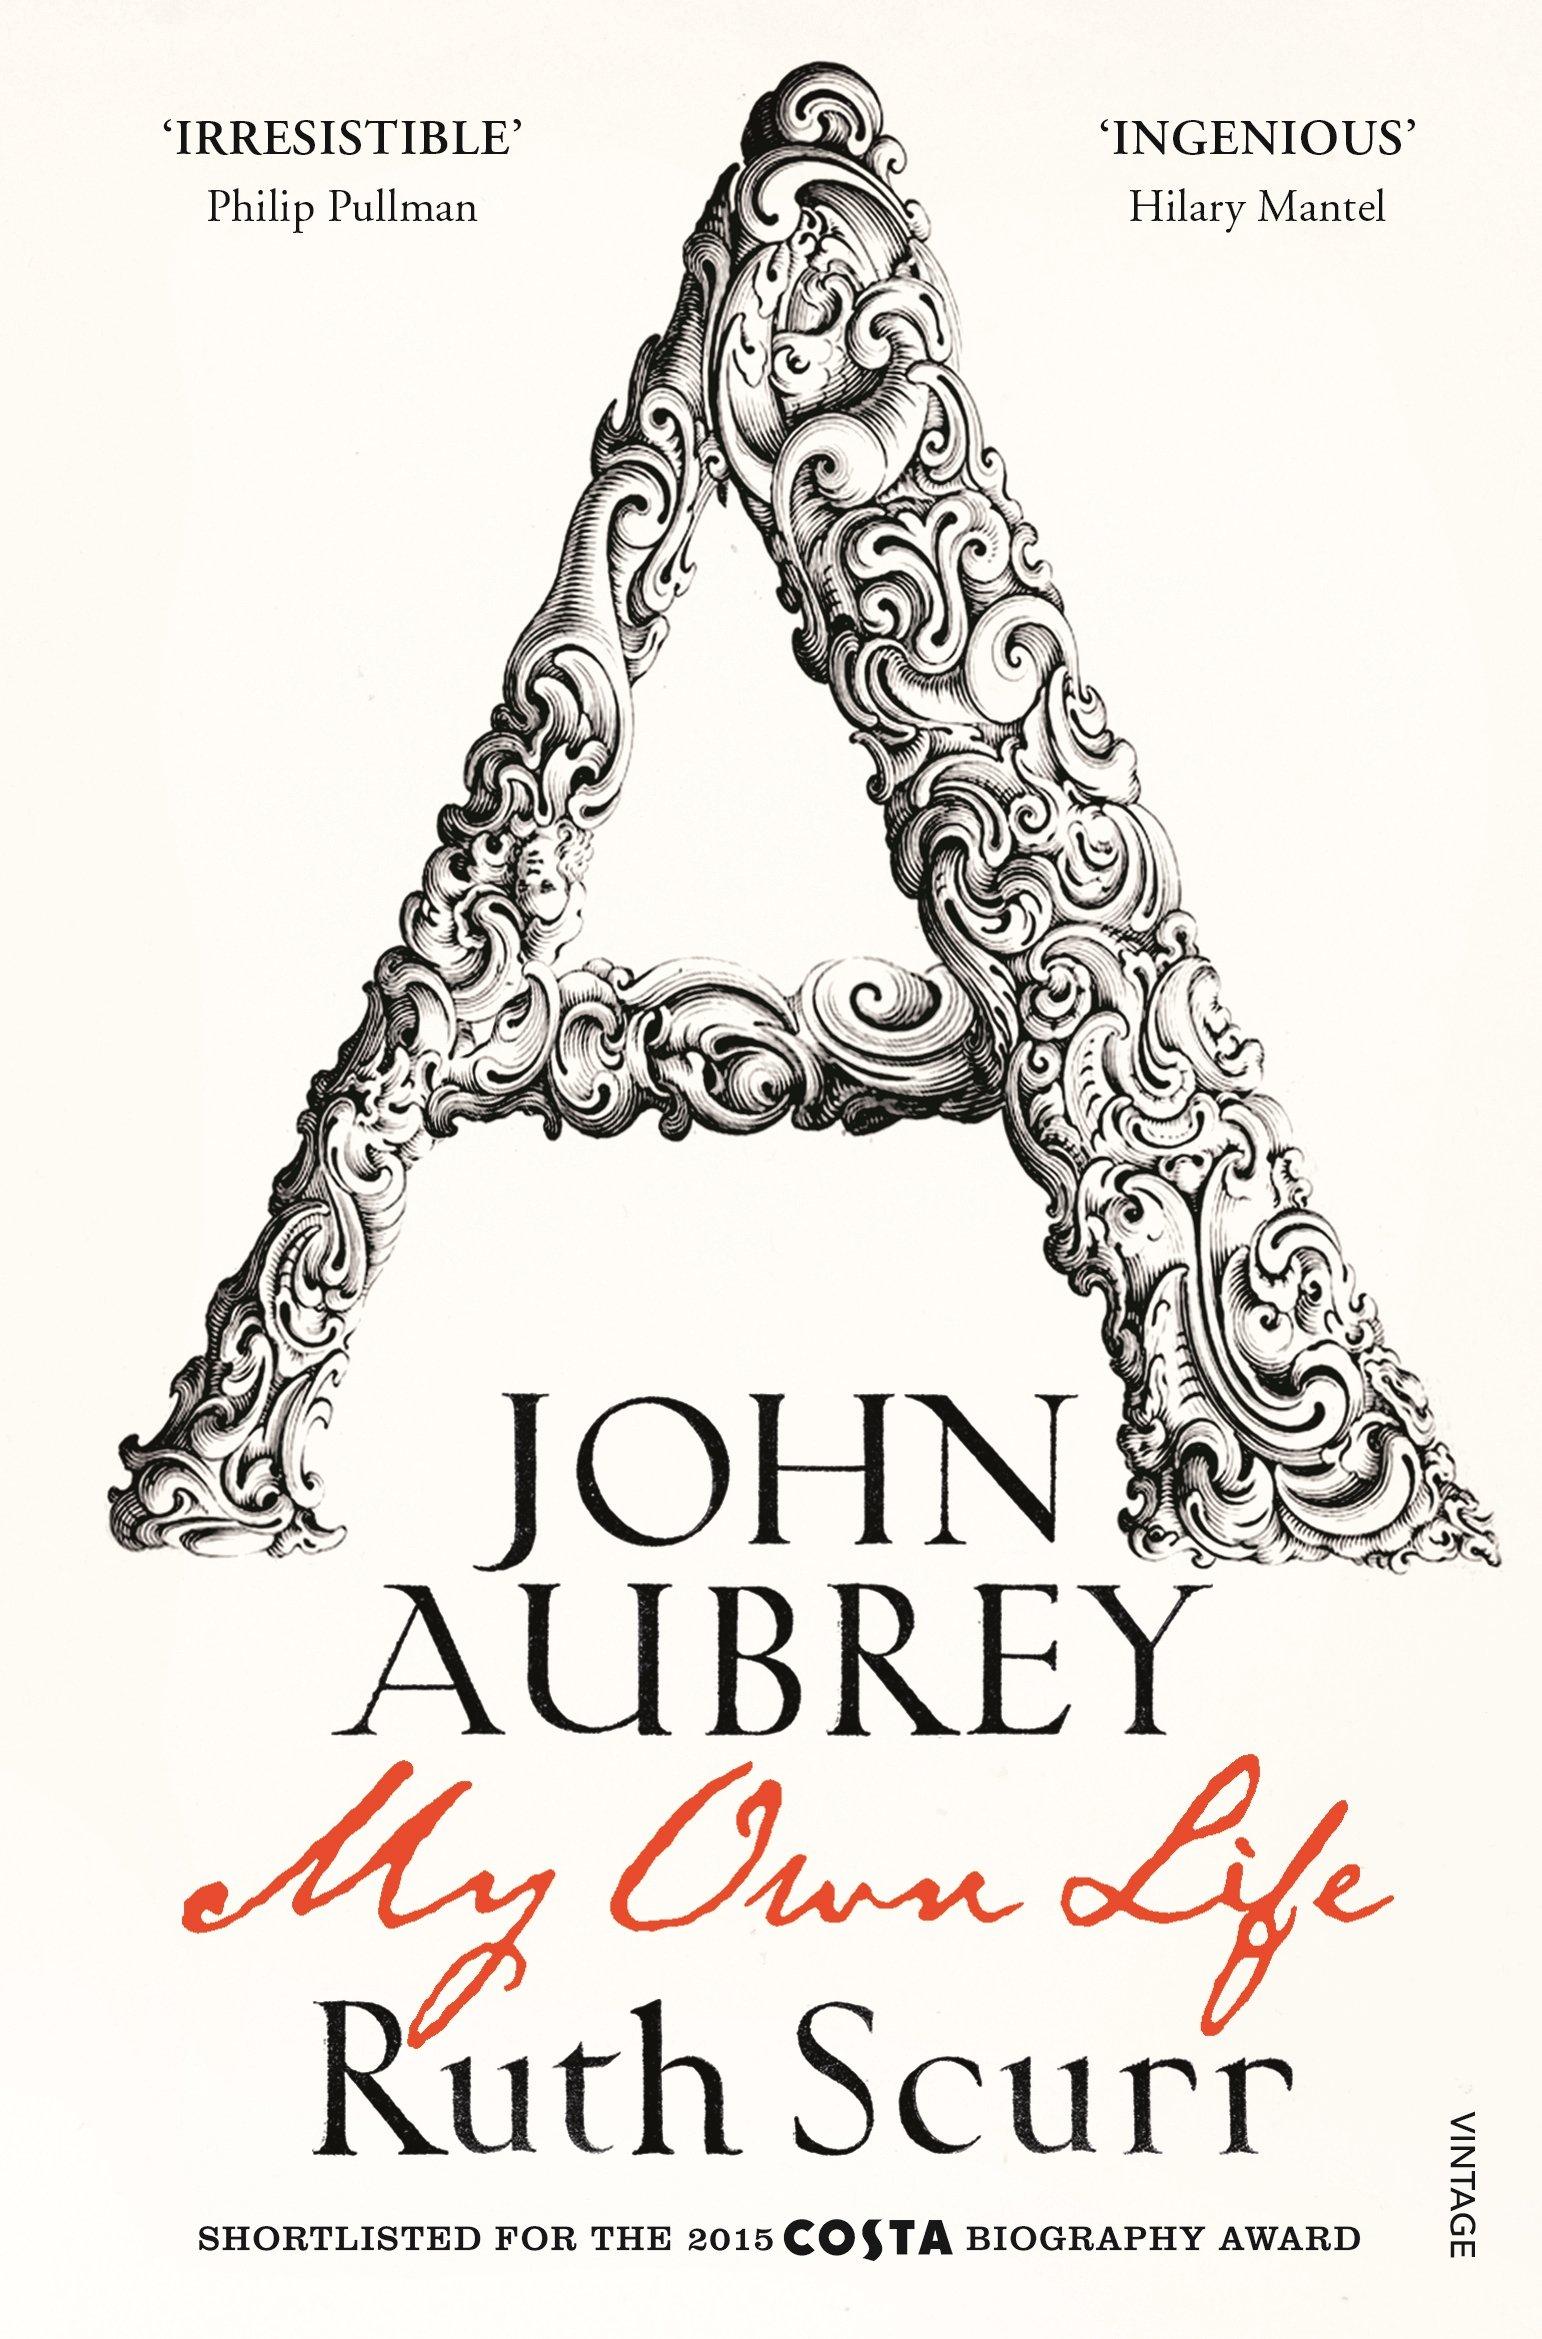 John Aubrey My Own Life by Ruth Scurr cover 2.jpg